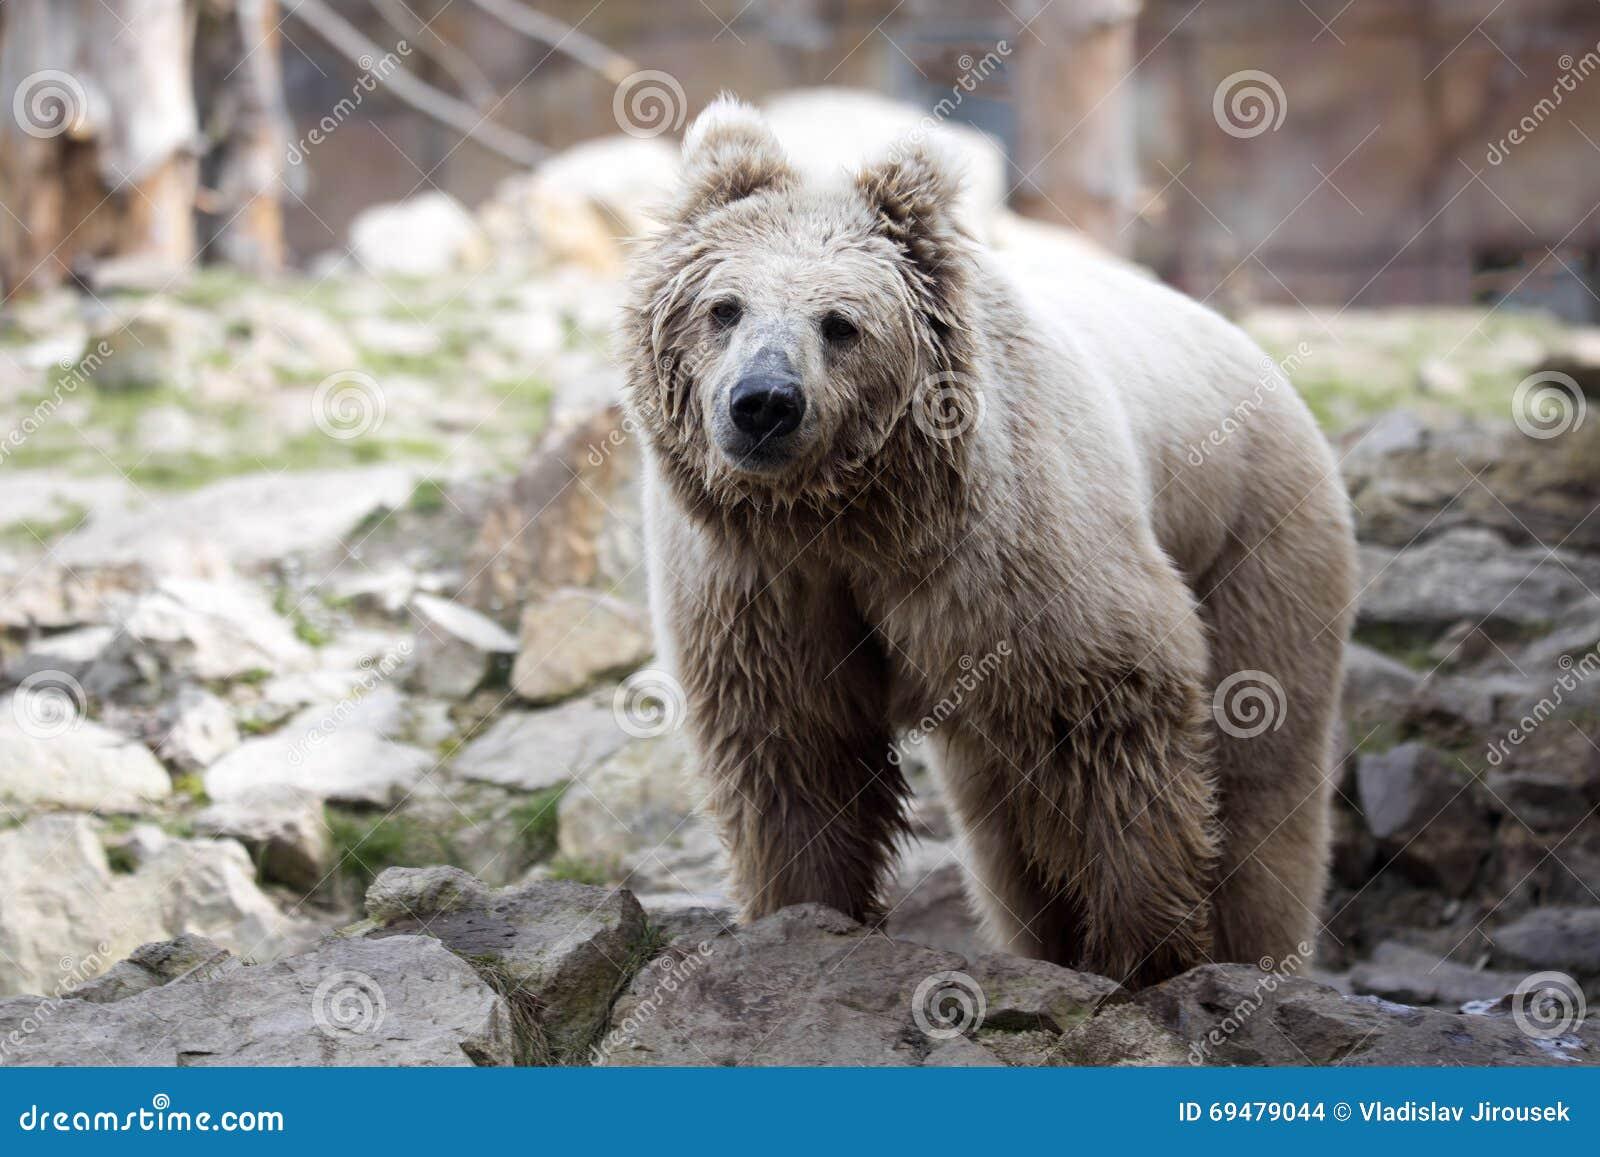 Image Gallery himalayan brown bear Himalayan Brown Bear Yeti